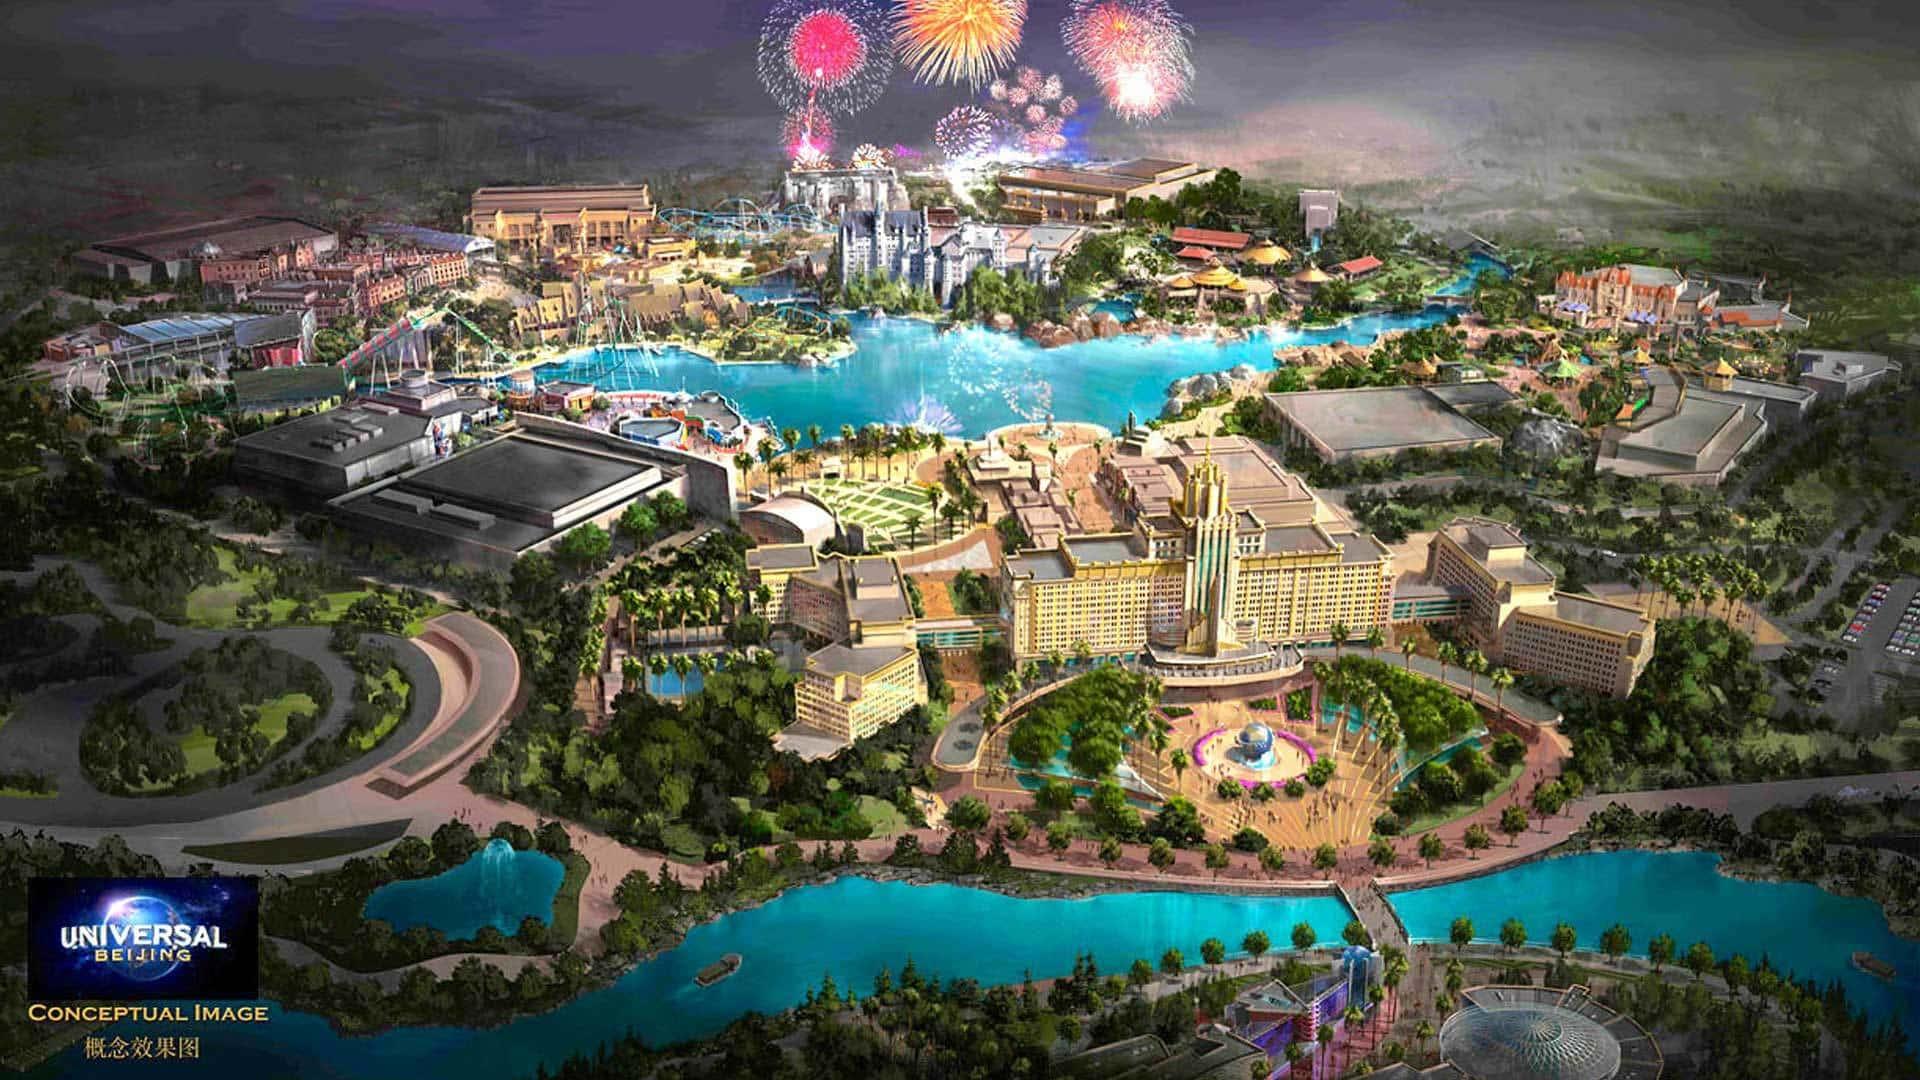 Universal expanding its global theme park empire?